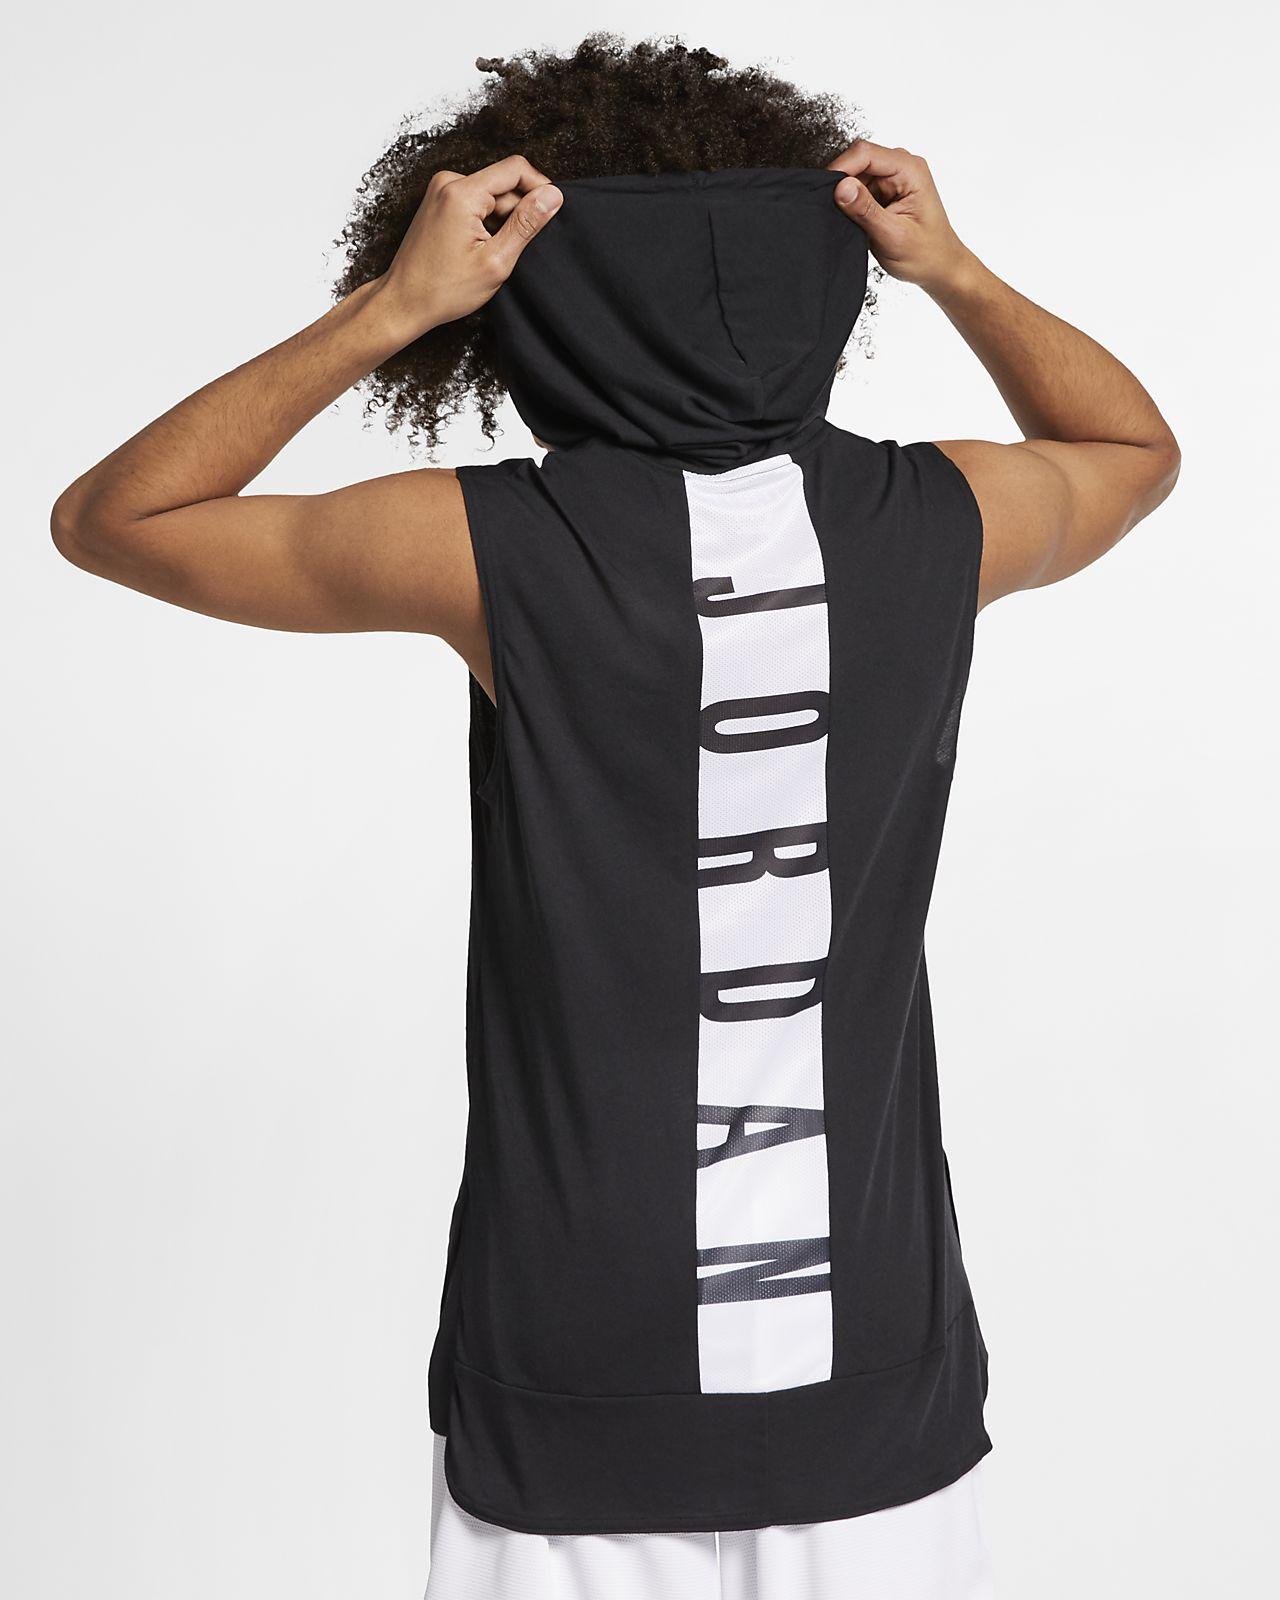 check out 12d4f a2dcb ... Jordan Dri-FIT 23 Alpha Men s Sleeveless Training Hoodie